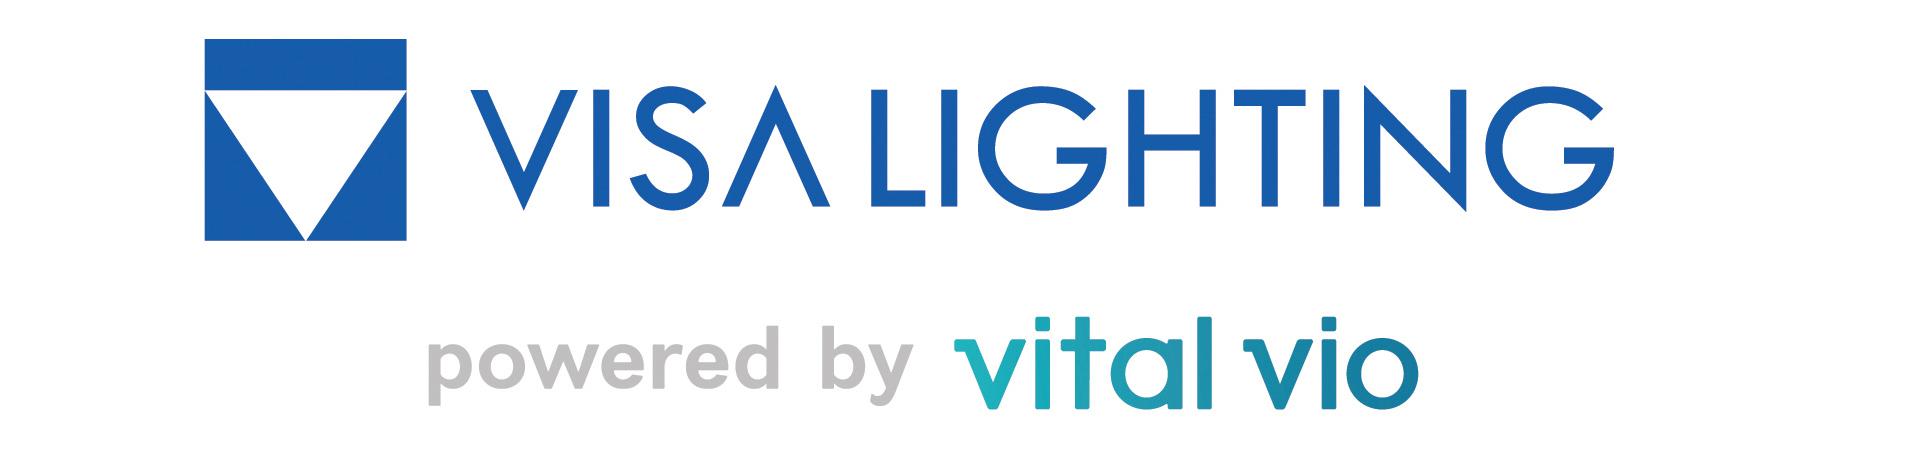 Visa Lighting powered by Vital Vio logo